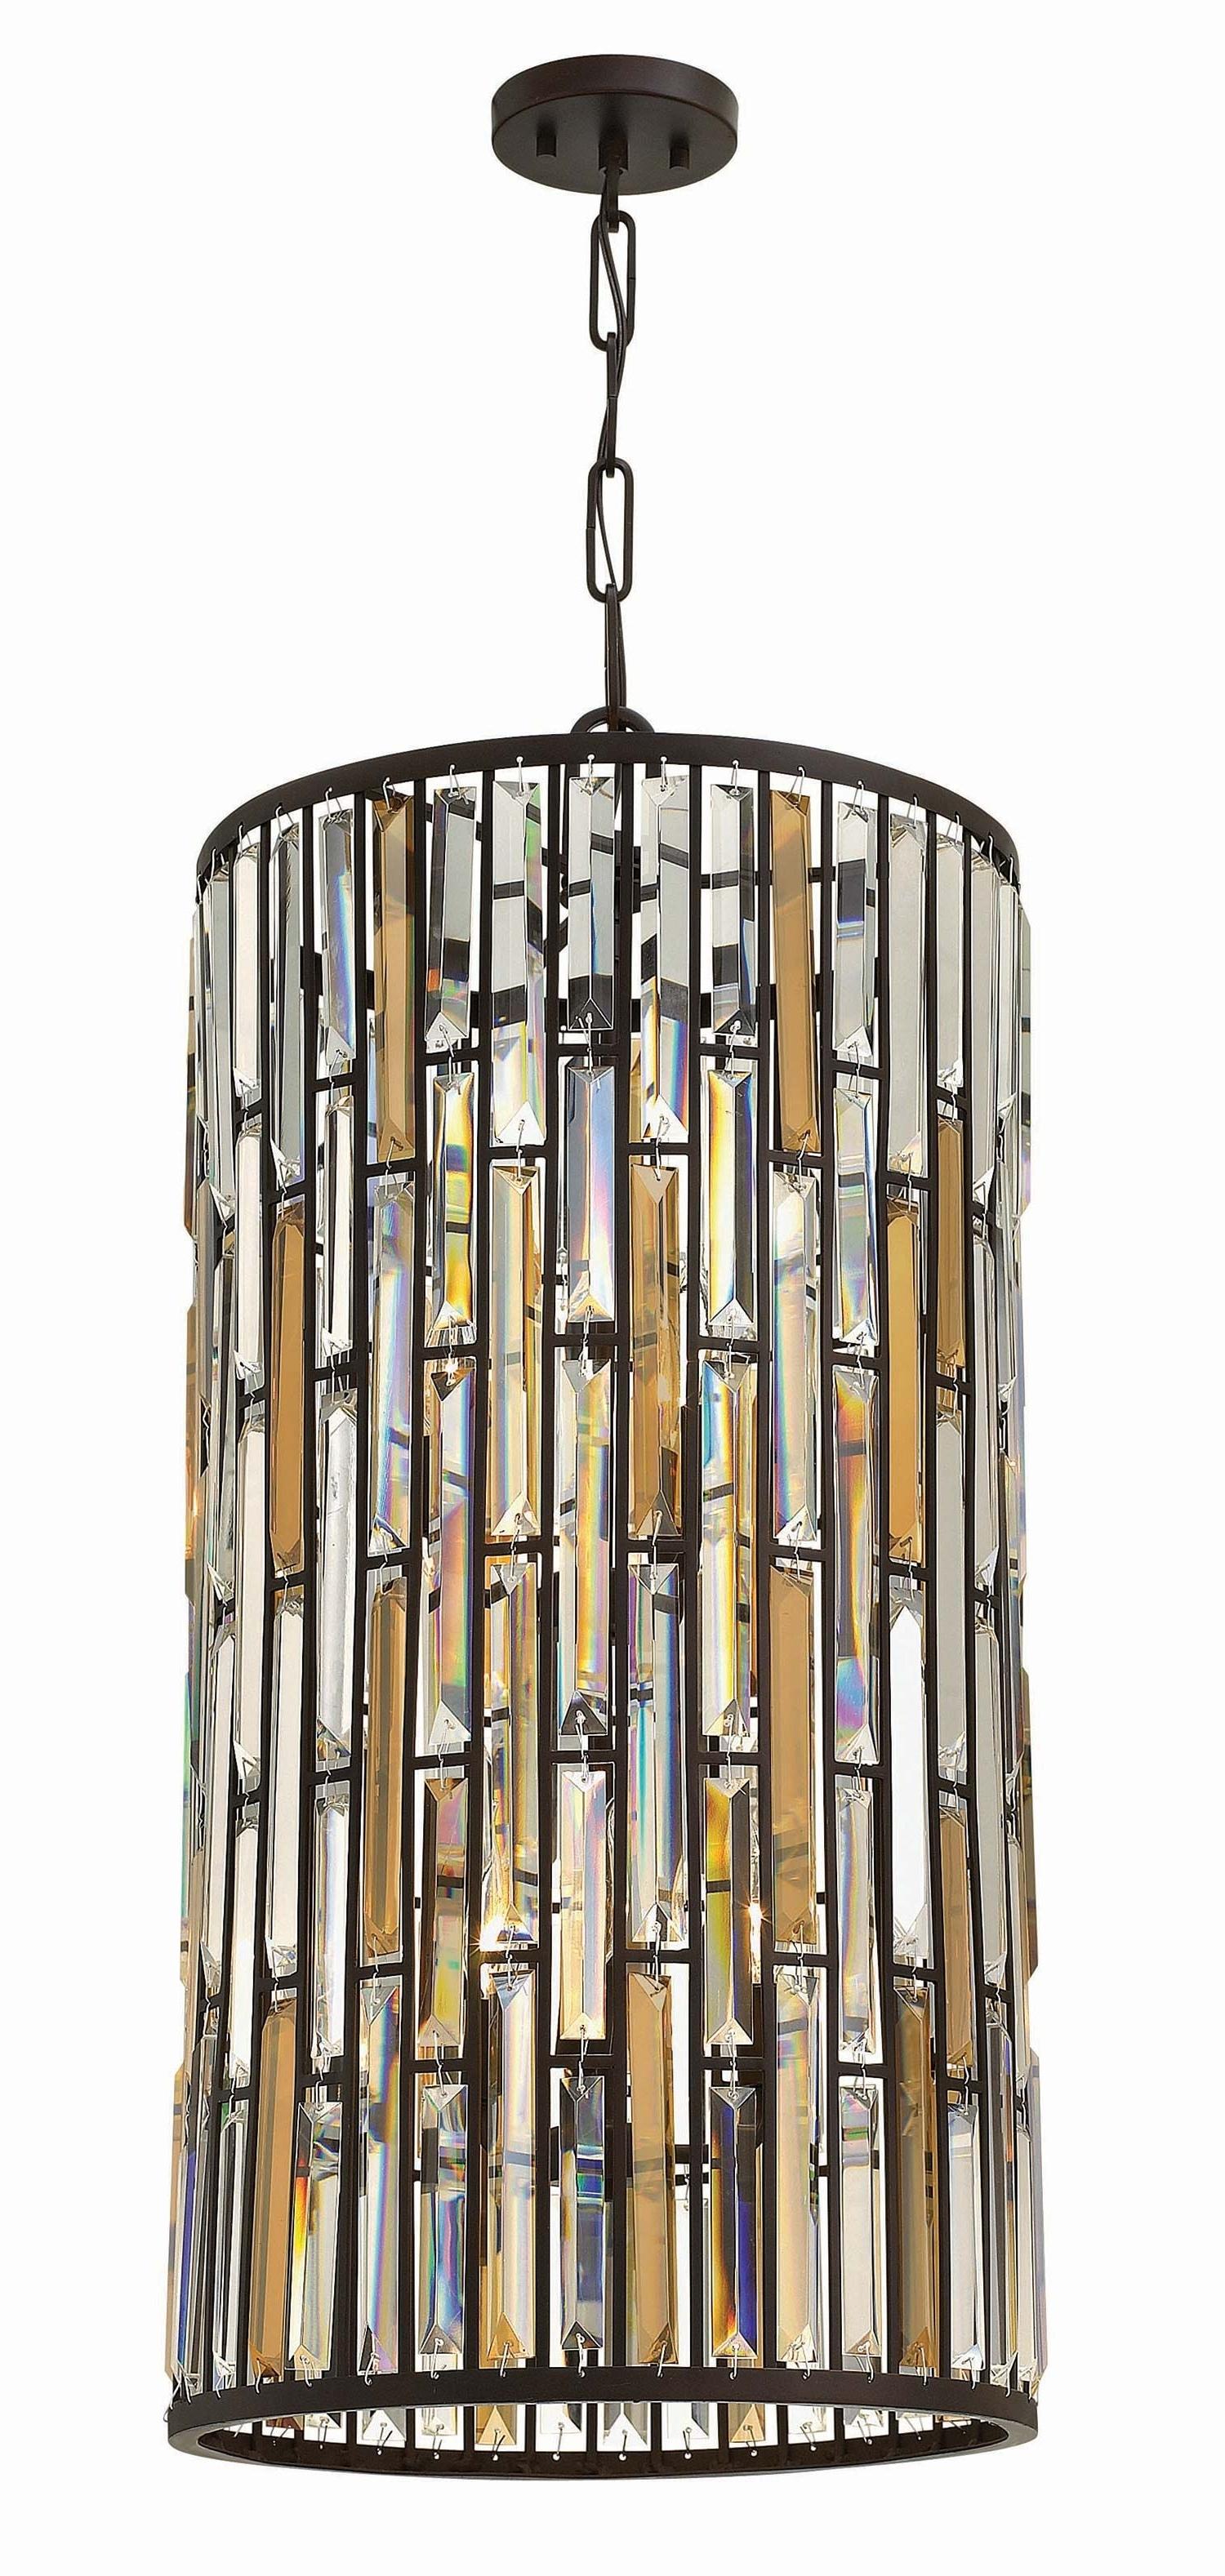 Hinkley Lighting 6 Light Gemma Foyer Iridescent Glass (View 13 of 20)